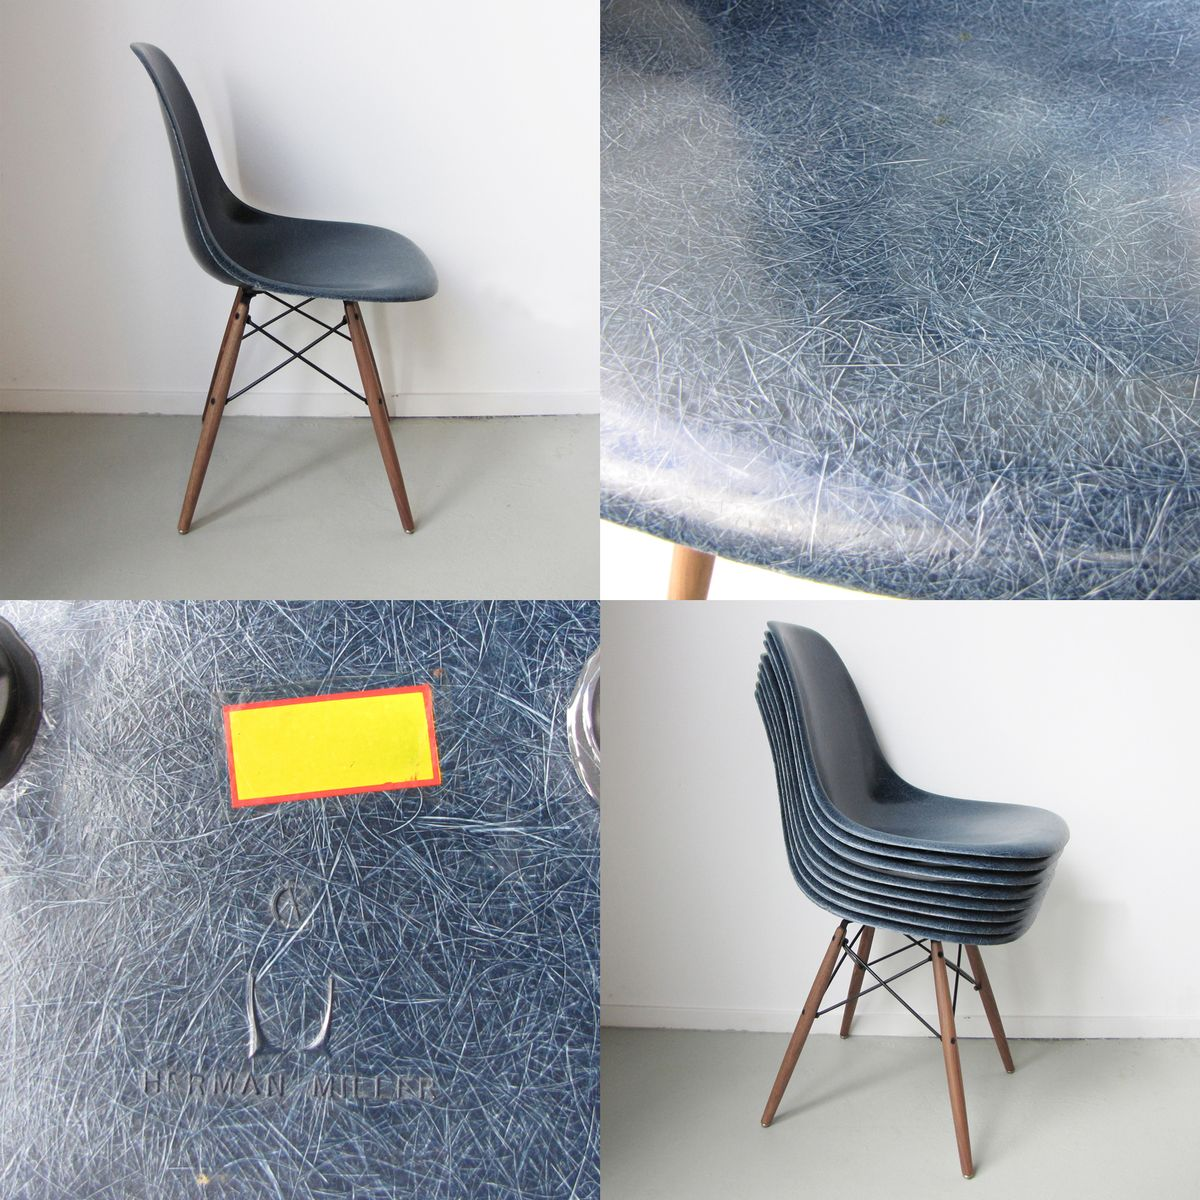 dsw stuhl von charles ray eames f r herman miller 1975 bei pamono kaufen. Black Bedroom Furniture Sets. Home Design Ideas